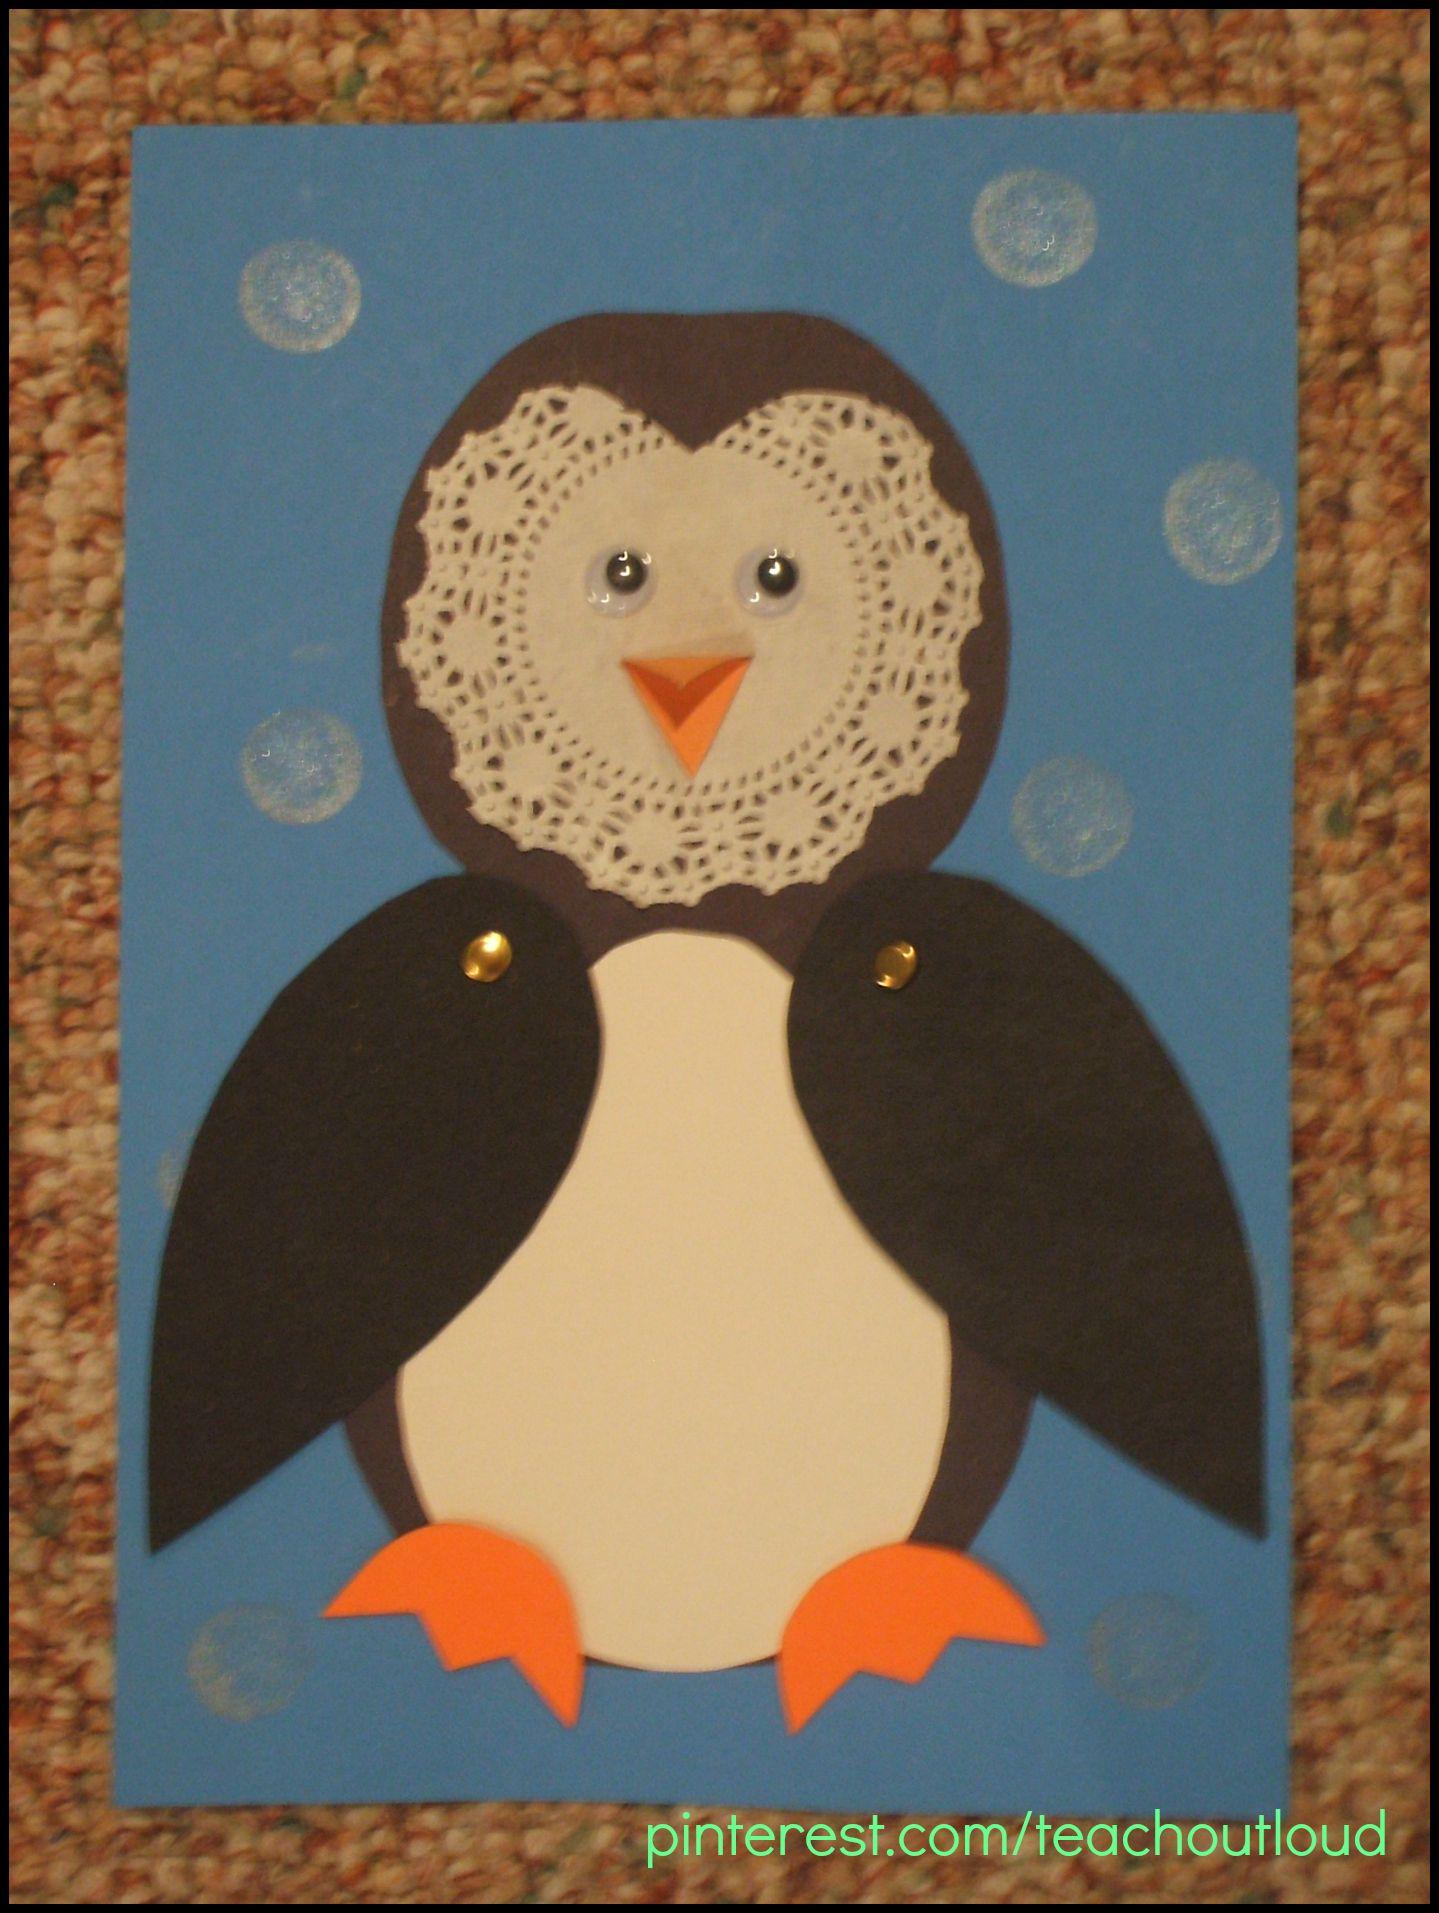 Doily Penguin Preschool Craft Following Directions